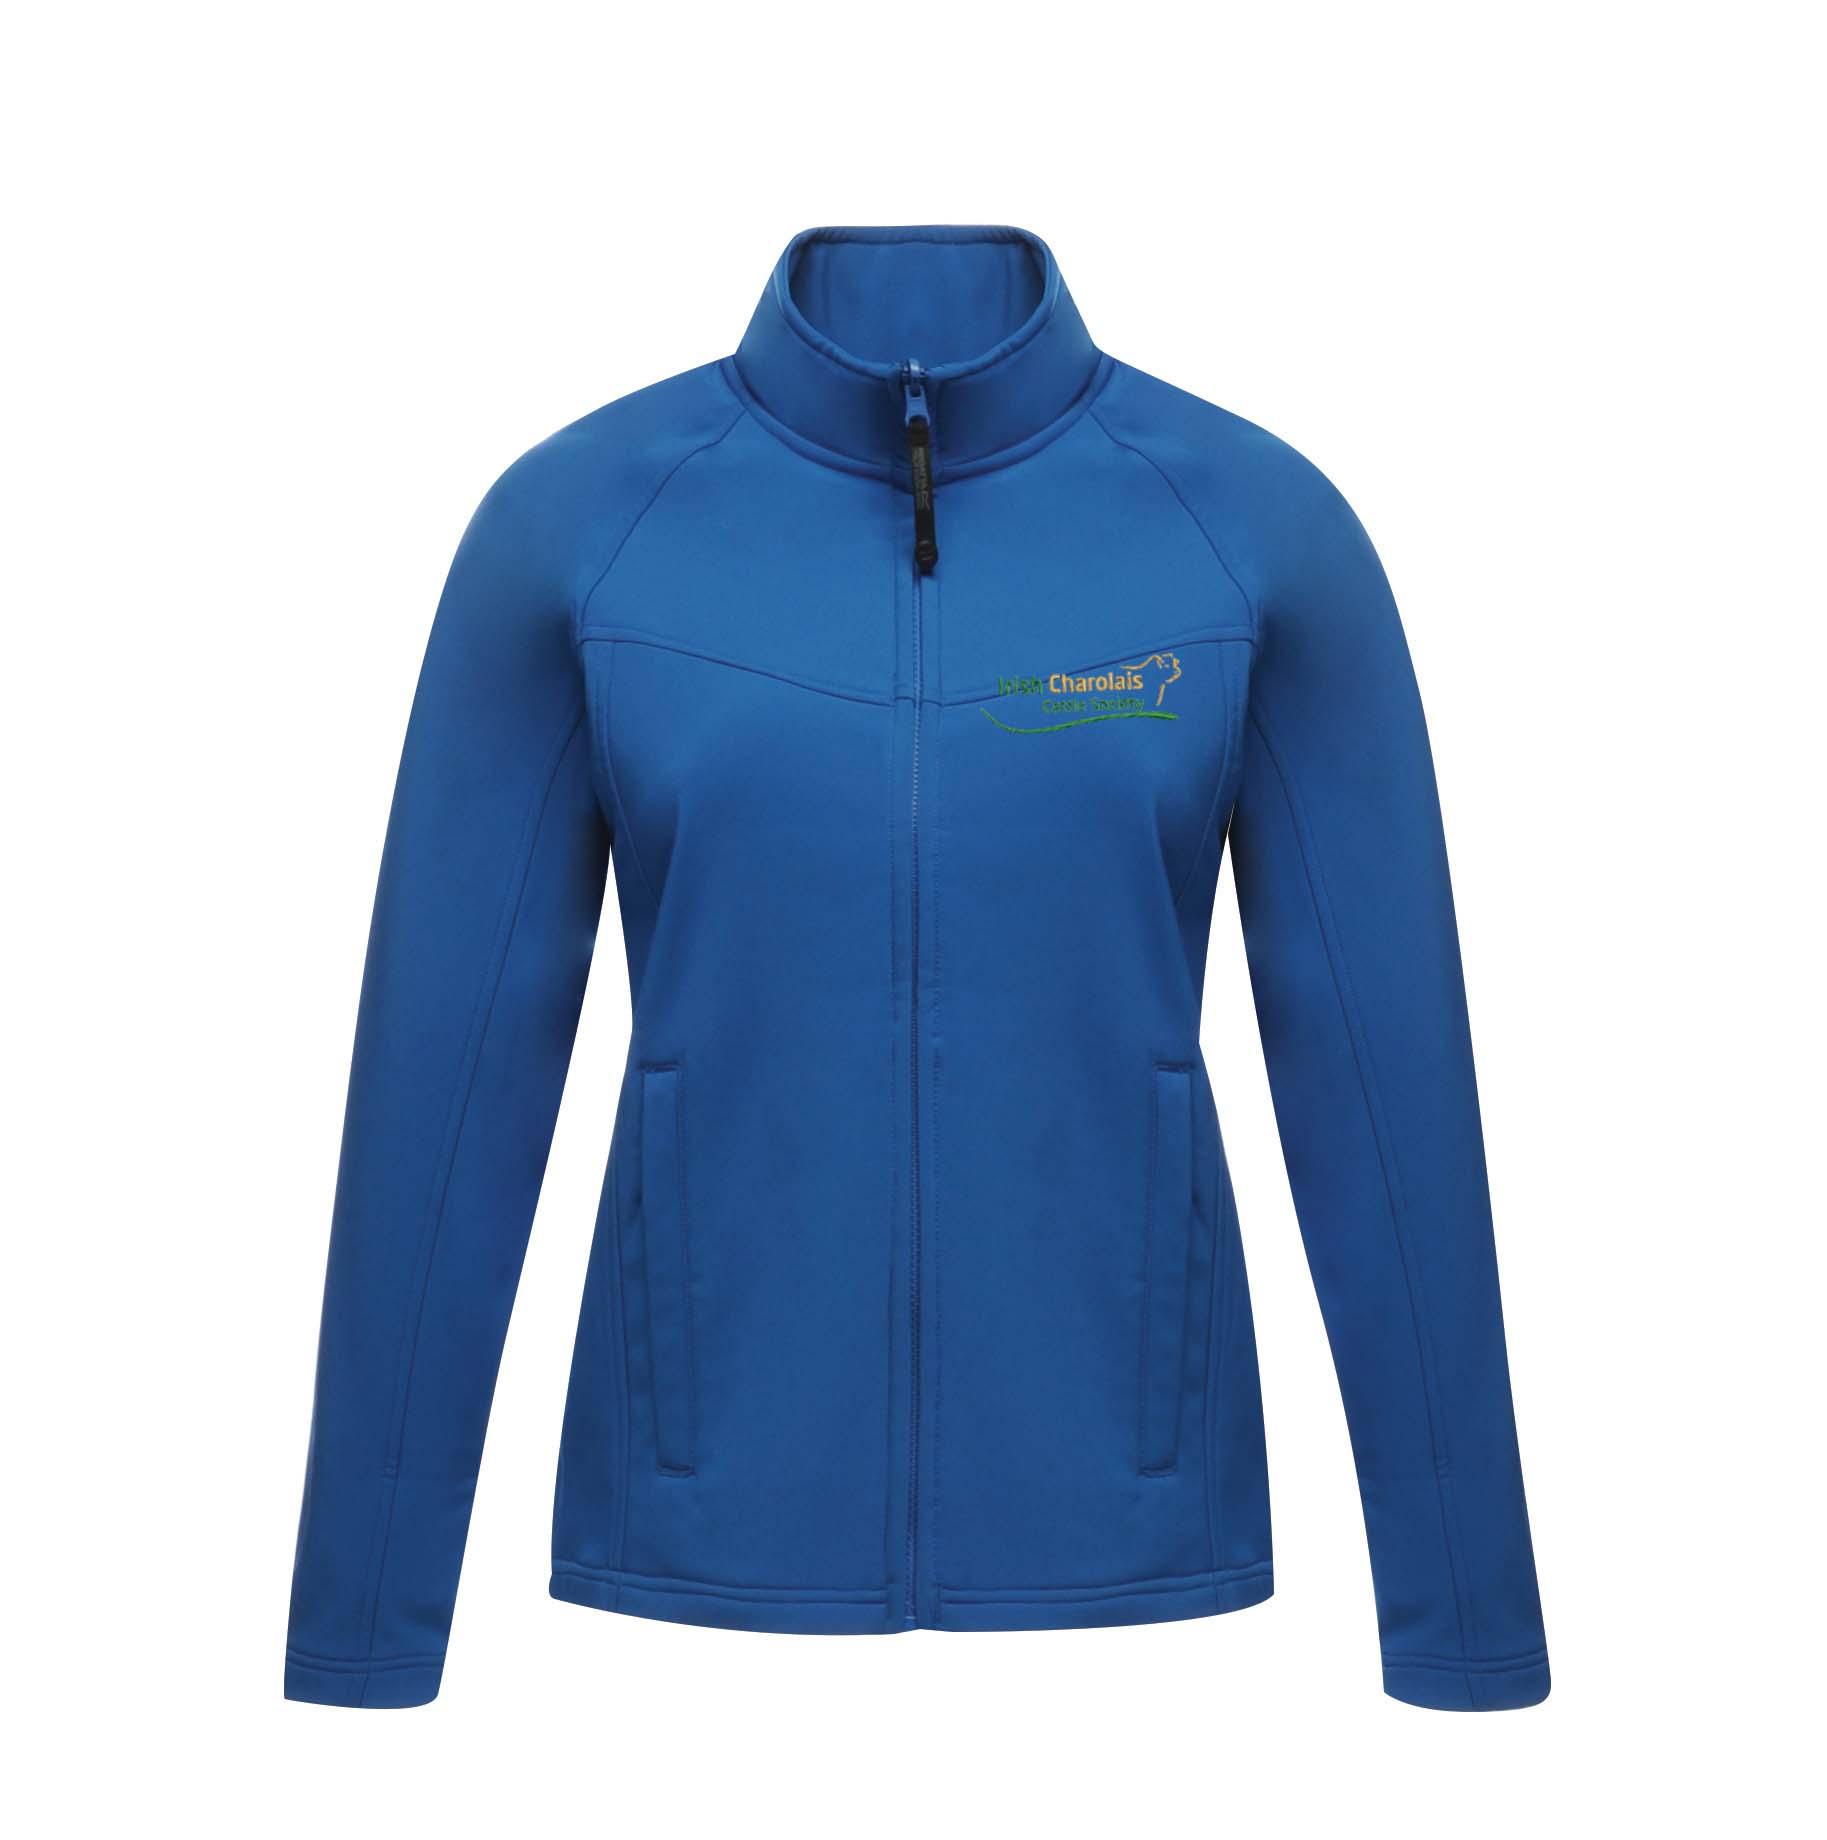 Irish Charolais Cattle Society Uproar Ladies Softshell Jacket